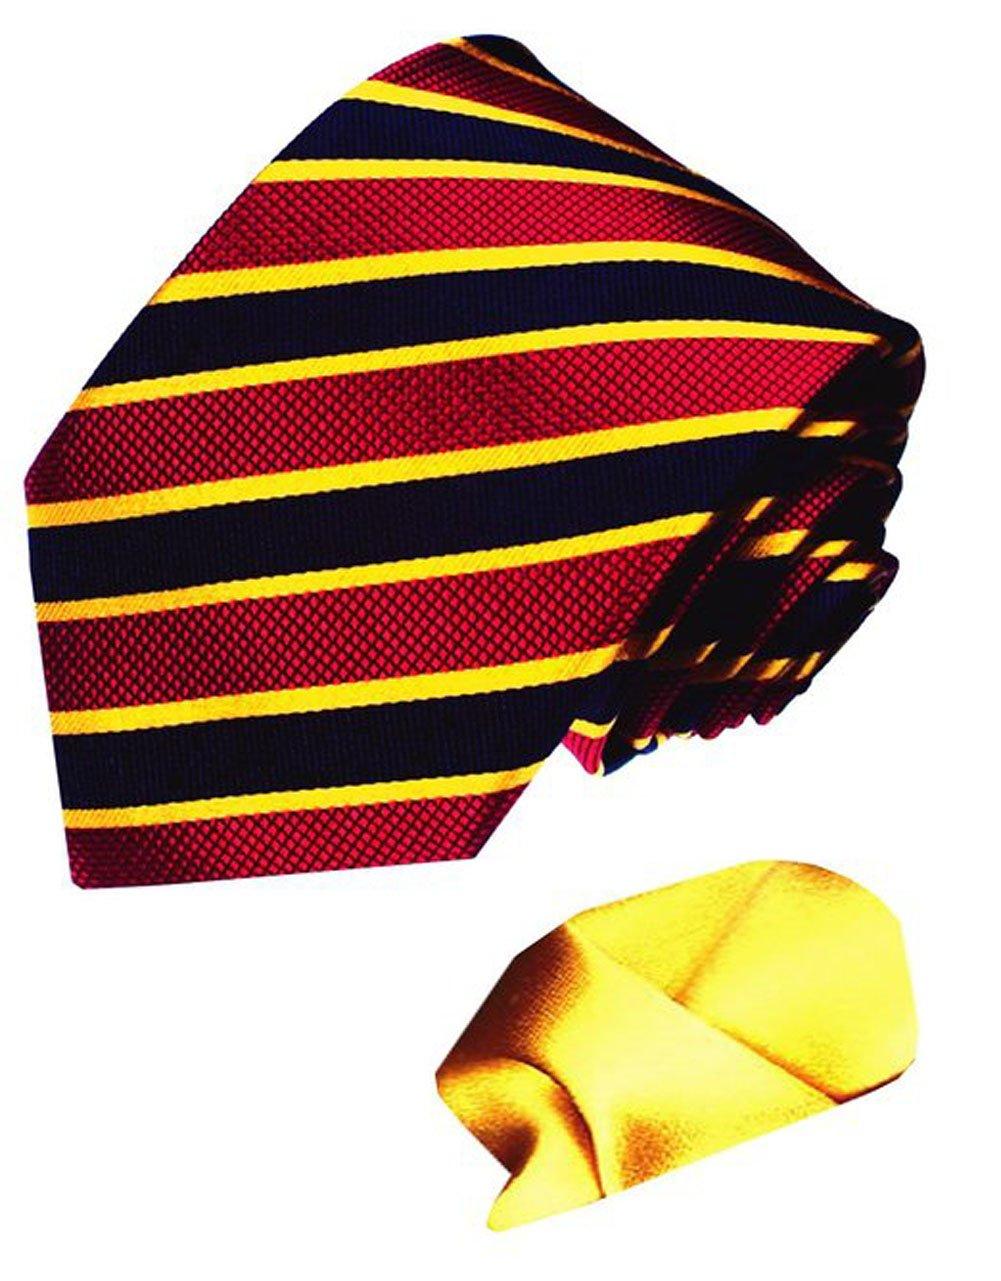 LORENZO CANA Italian 100% Pure Silk Woven Tie Hanky Set Red Blue Gold 7712601 by LORENZO CANA (Image #1)